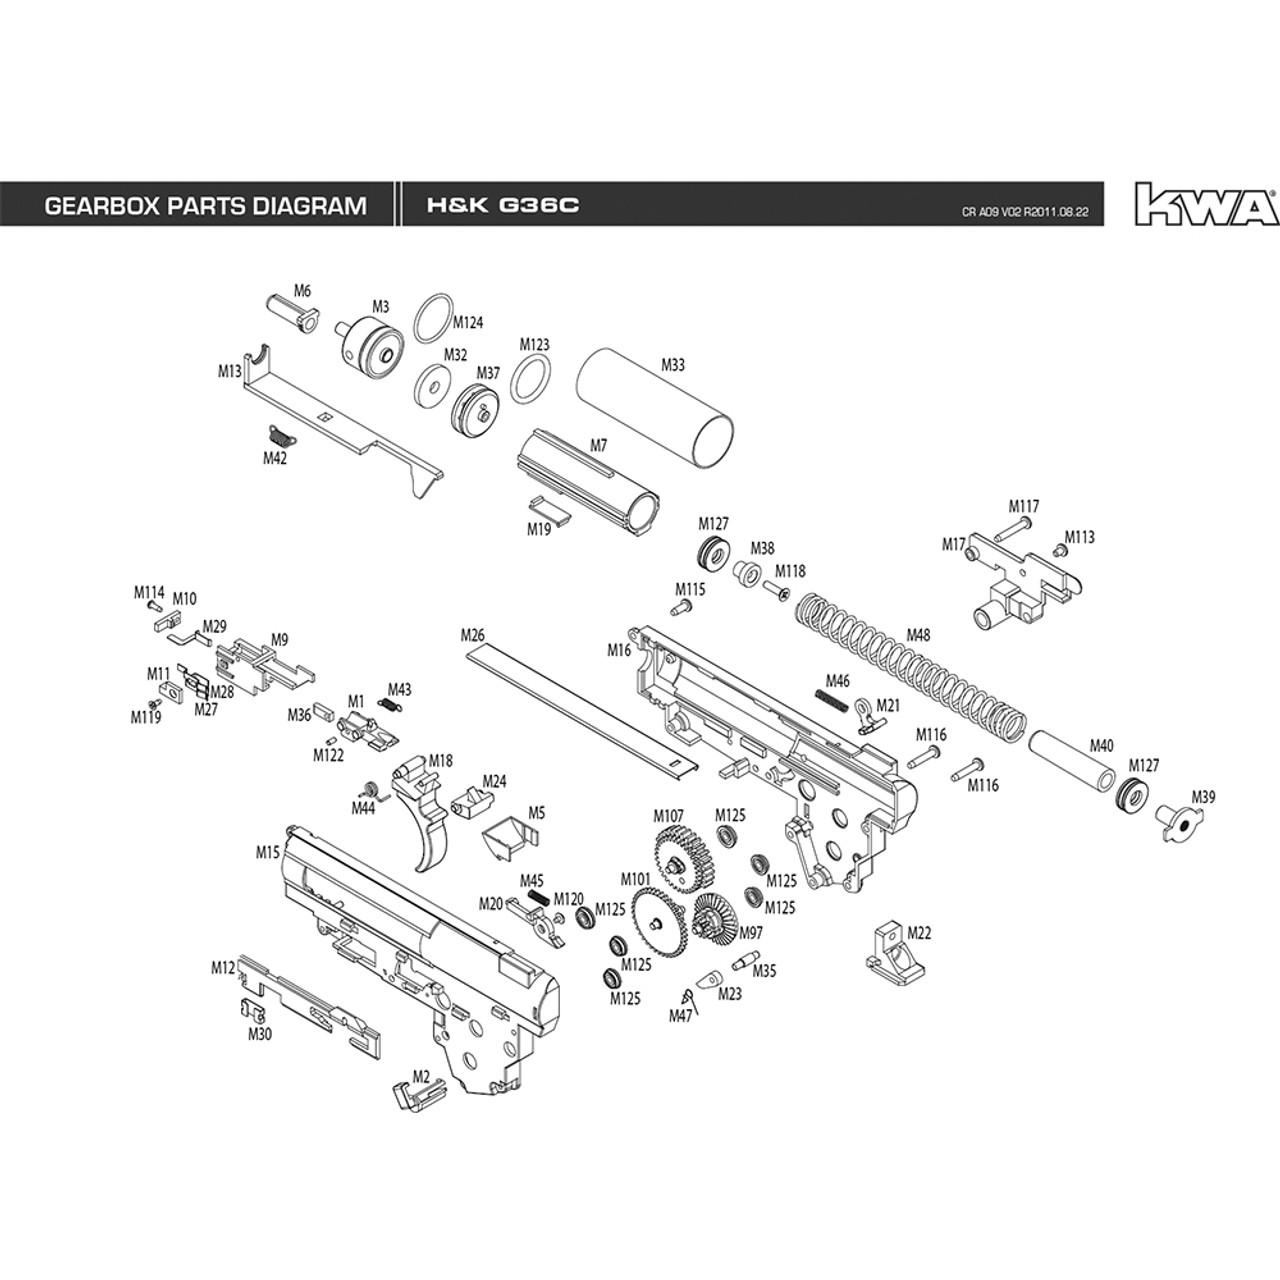 KWA AIRSOFT H&K G36C GEARBOX DIAGRAM low price of $0MiR Tactical